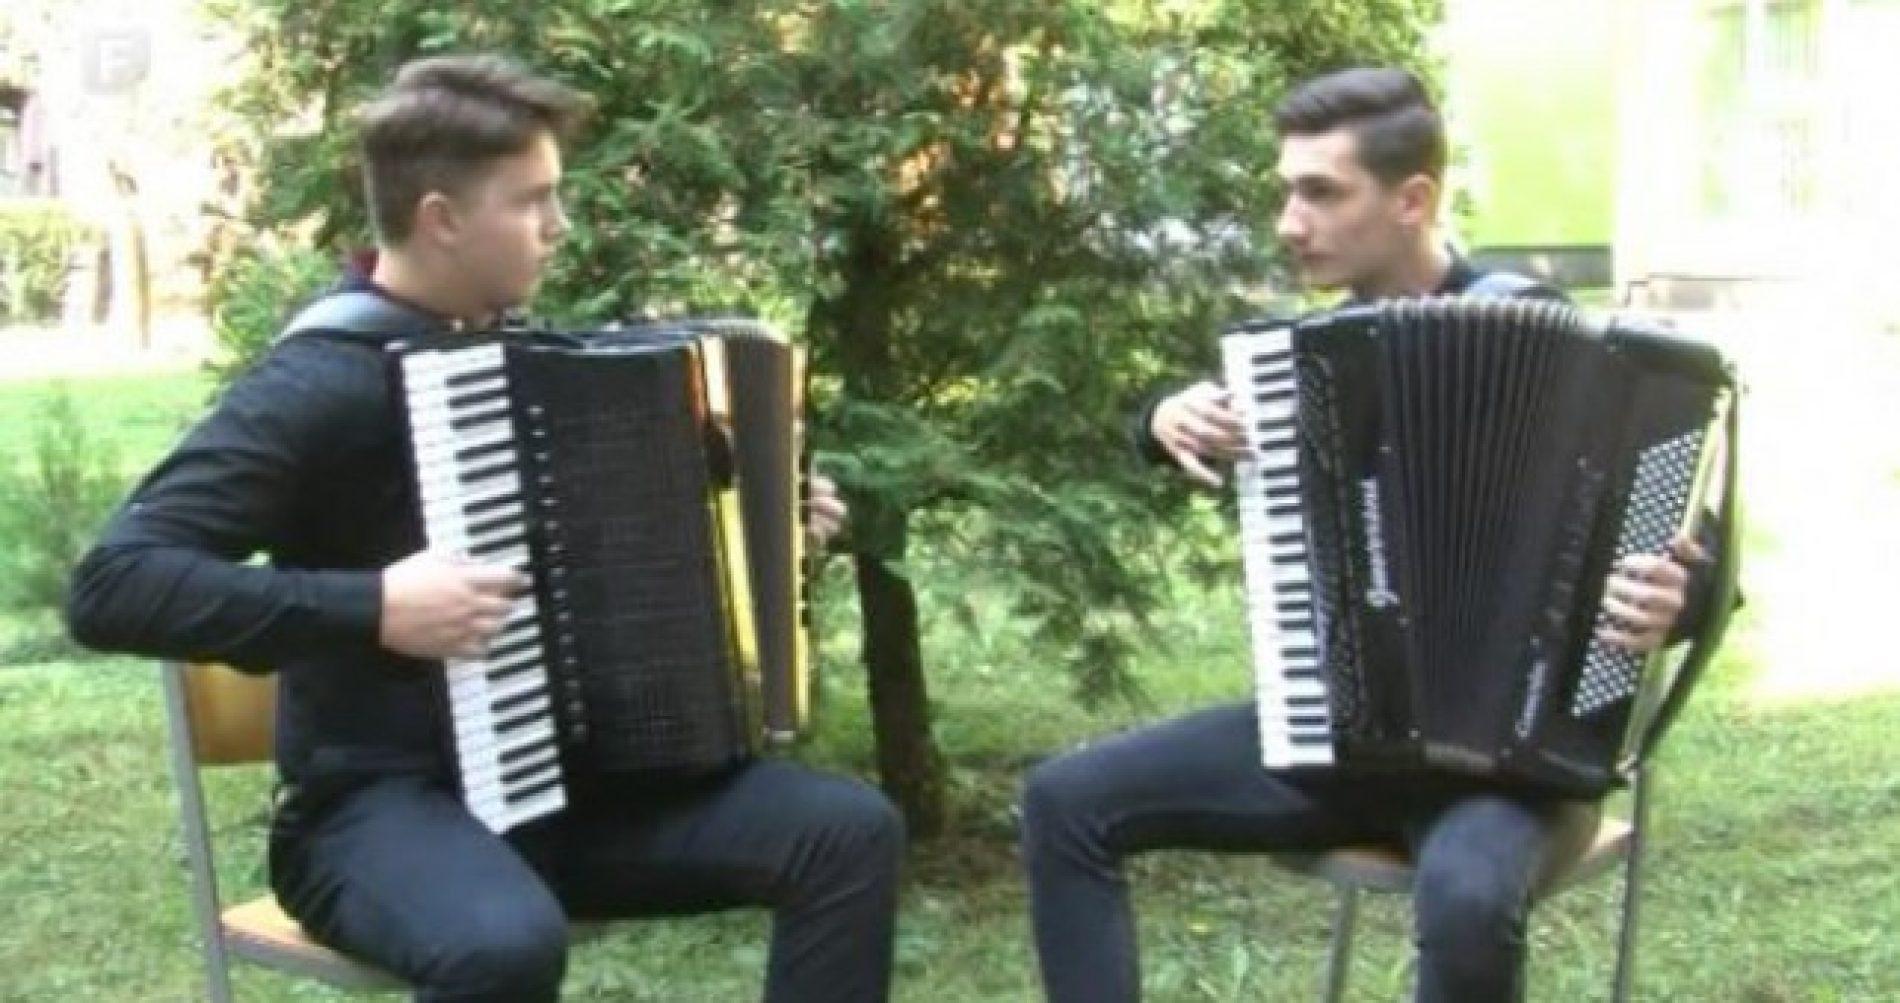 Mladi i talentovani Zeničani Ivan i Adi osvajaju nagrade (Video)